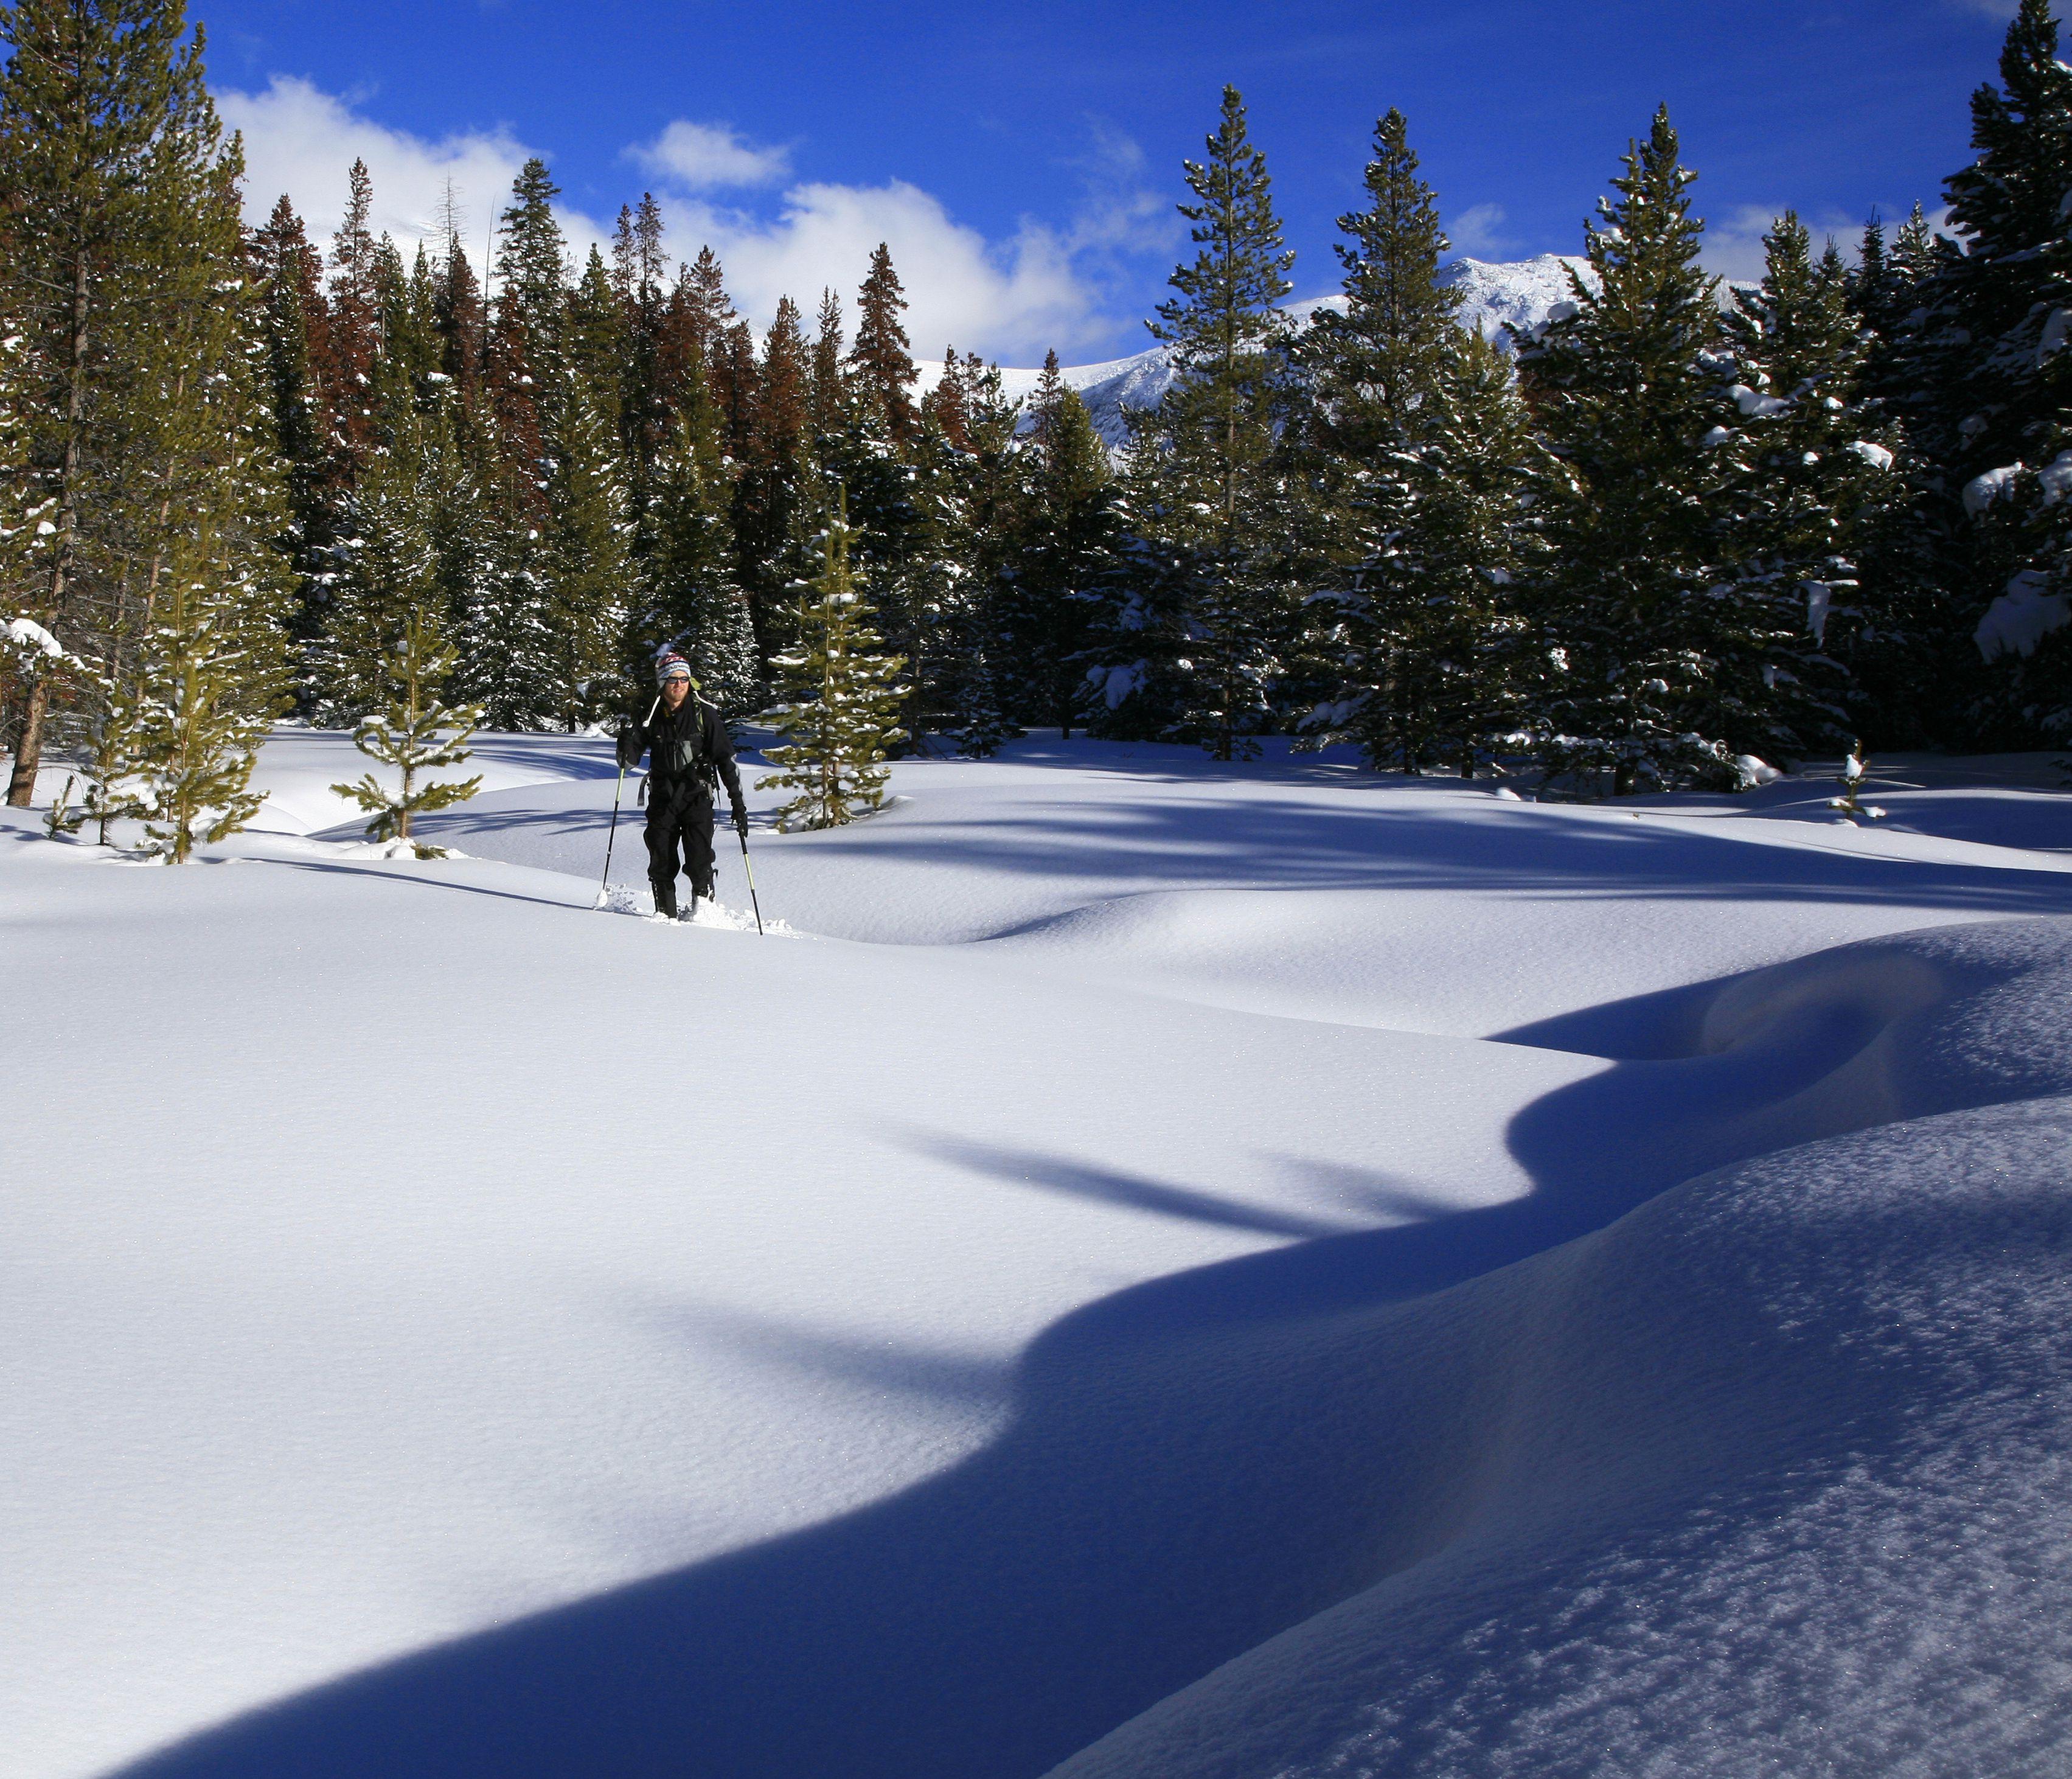 ski resorts and mountains near denver colorado